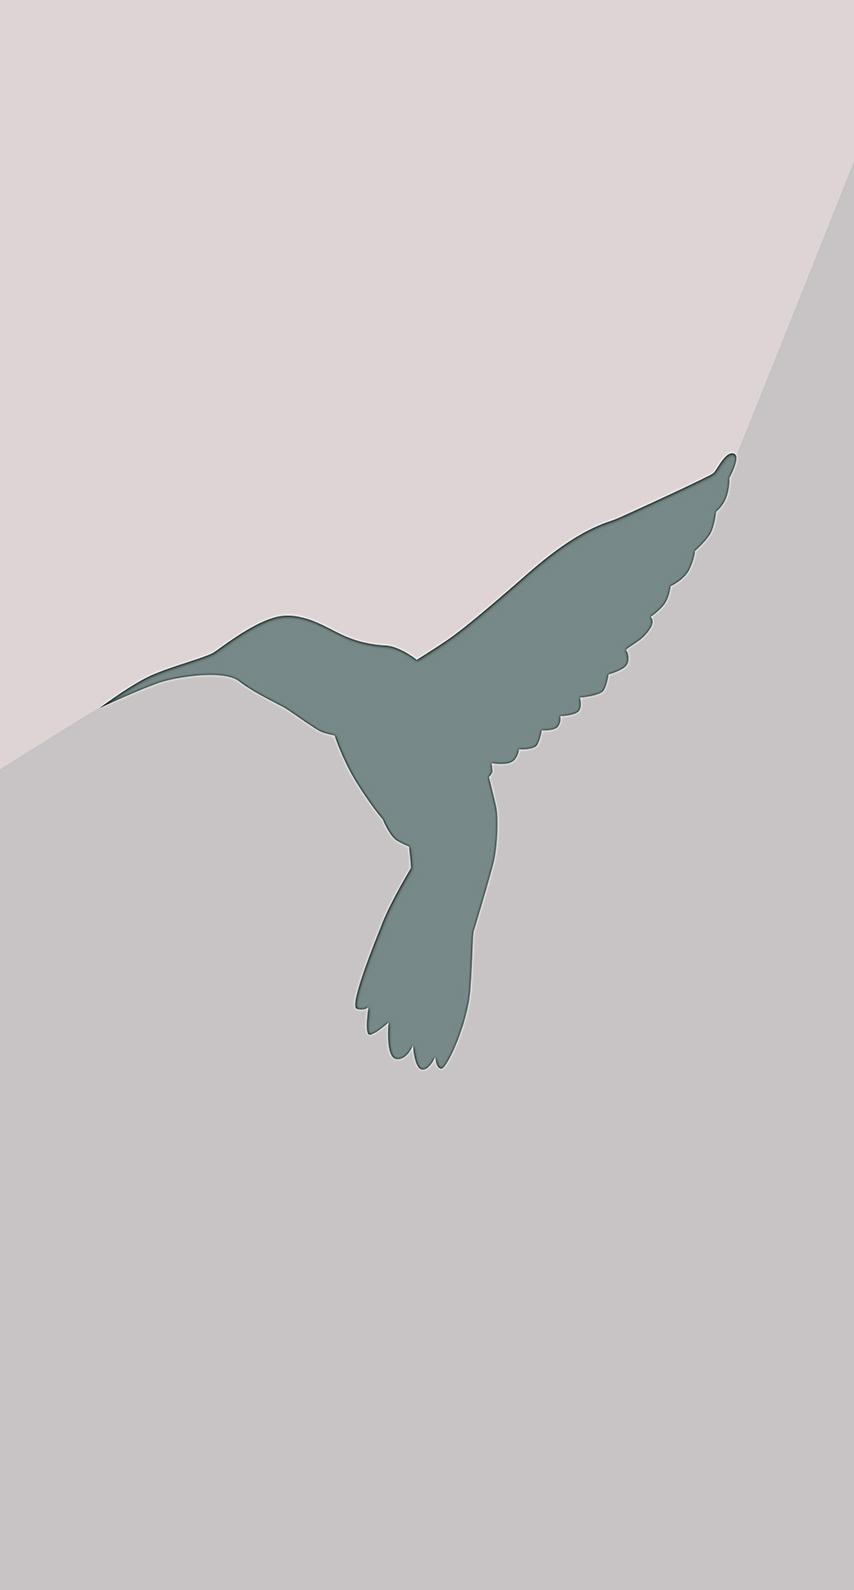 image, sign, disjunct, pigeon